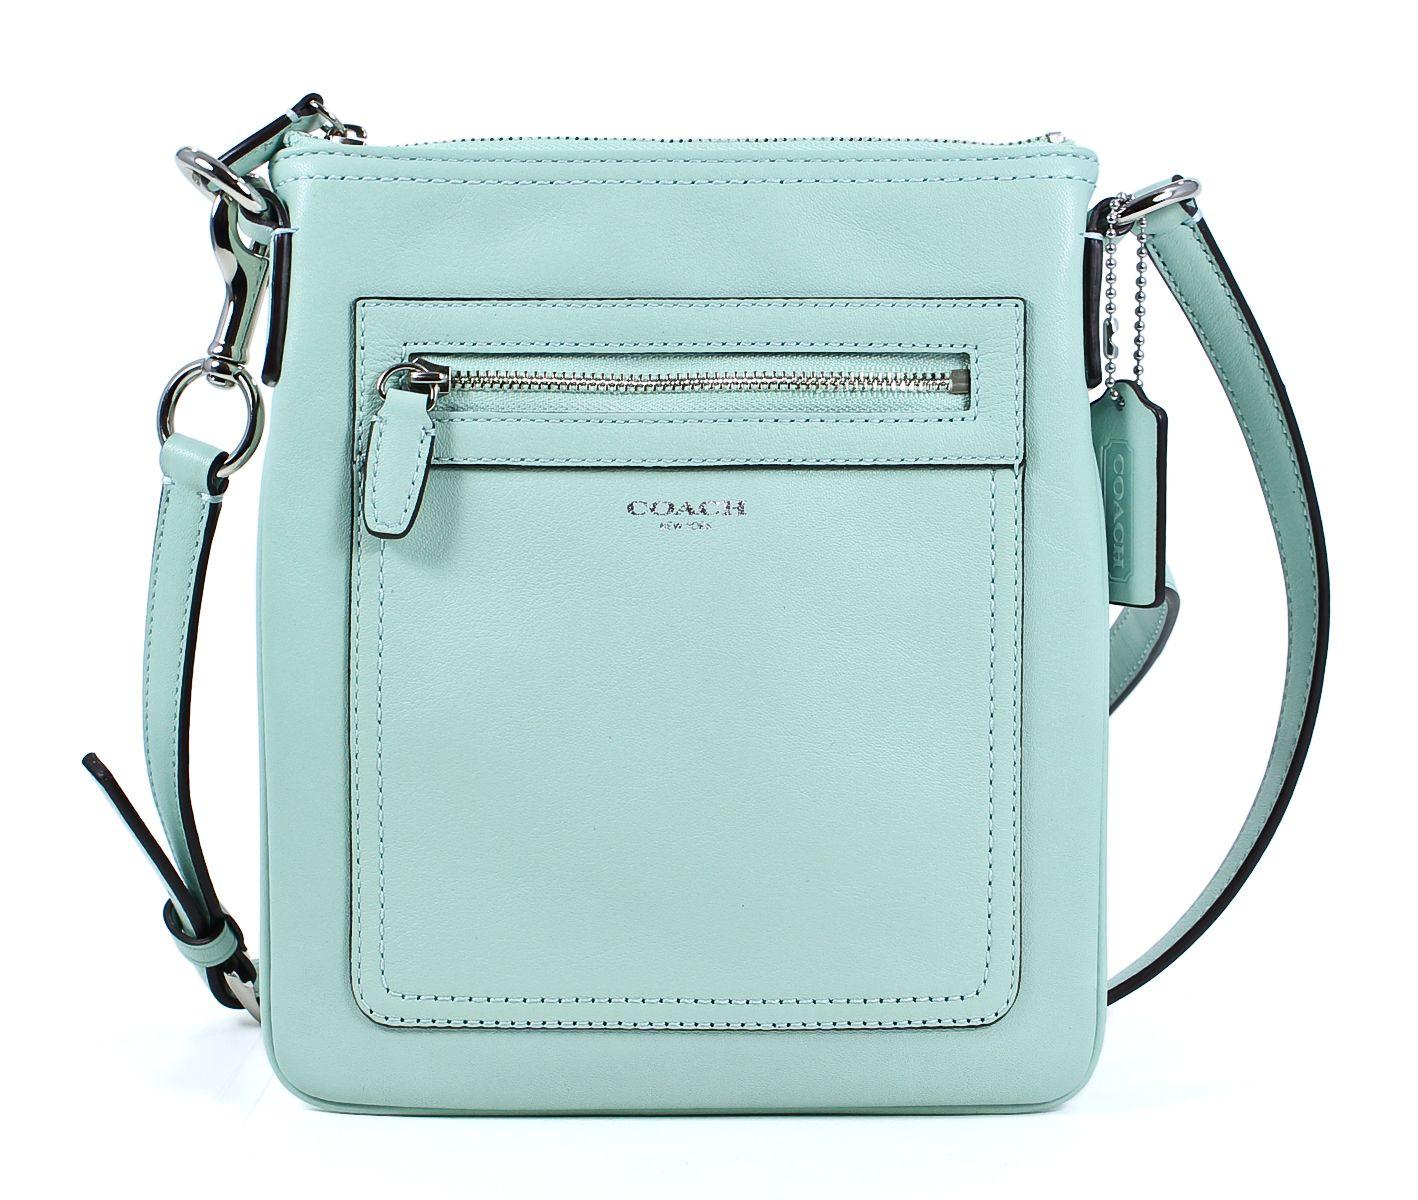 Coach Legacy Leather Swingpack Mint Green Crossbody Shoulder Bag ...